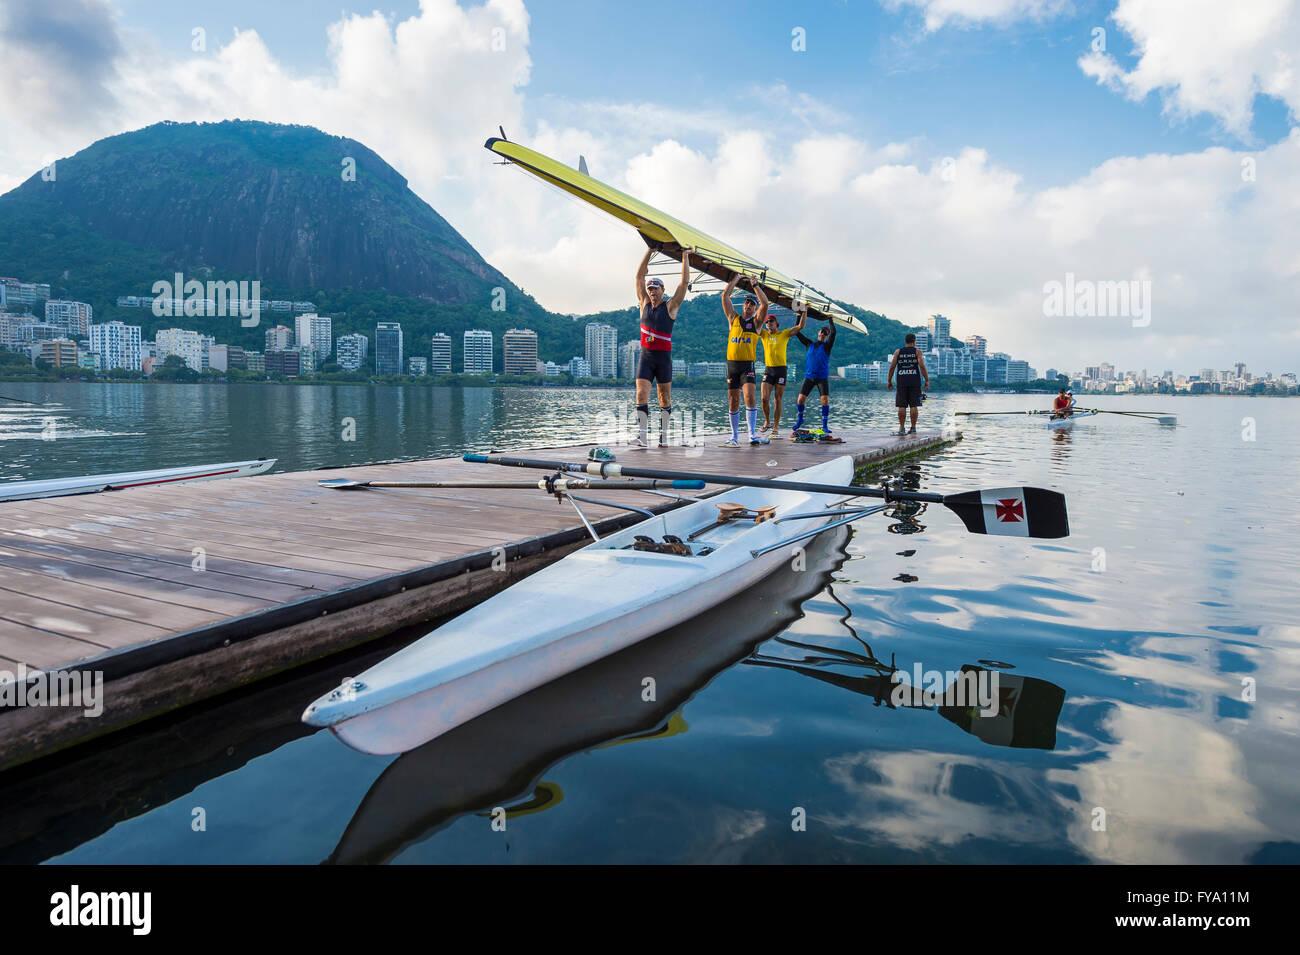 RIO DE JANEIRO - 1. April 2016: Mitglieder des Vasco da Gama-Ruderclub tragen ihr Boot am Lagoa Rodrigo de Freitas. Stockbild